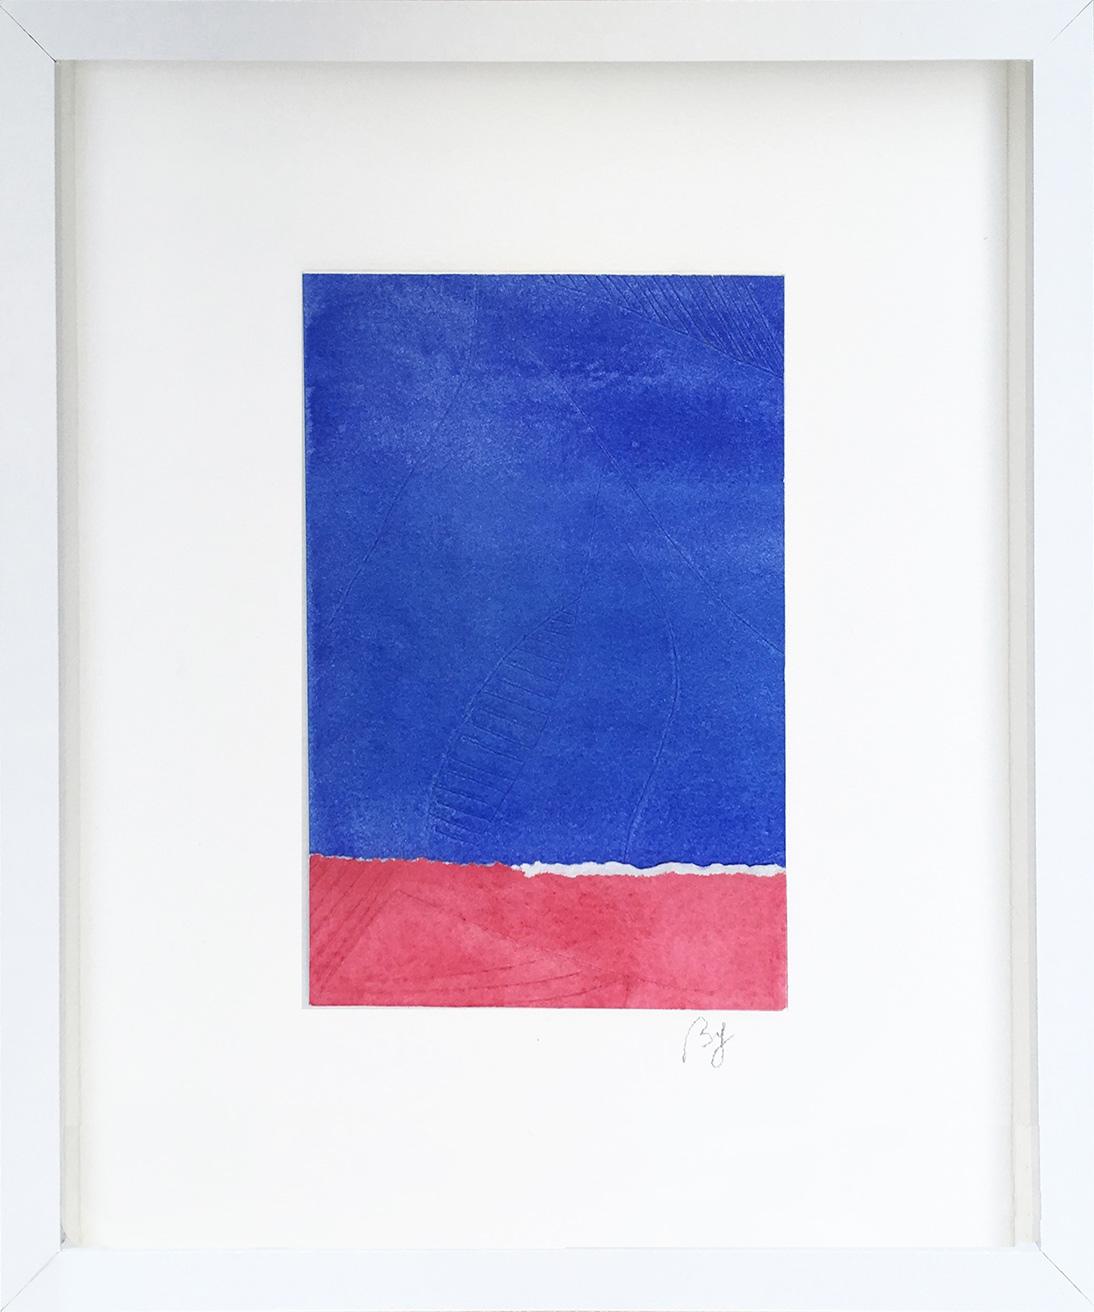 Oeuvre sur papier - Bernard Gortais - Continuum 84